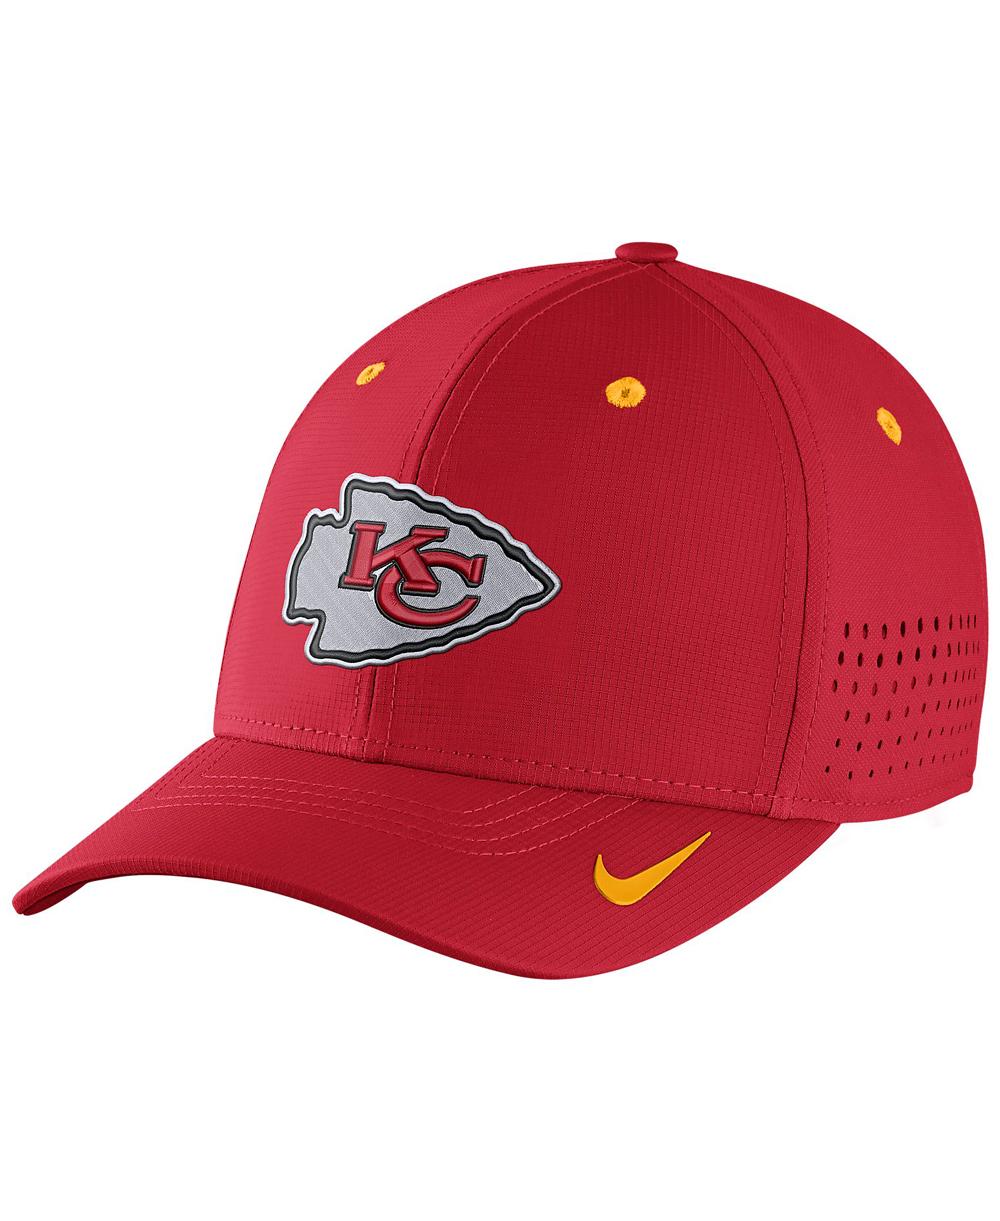 Legacy Vapor Swoosh Flex Gorra para Hombre NFL Chiefs